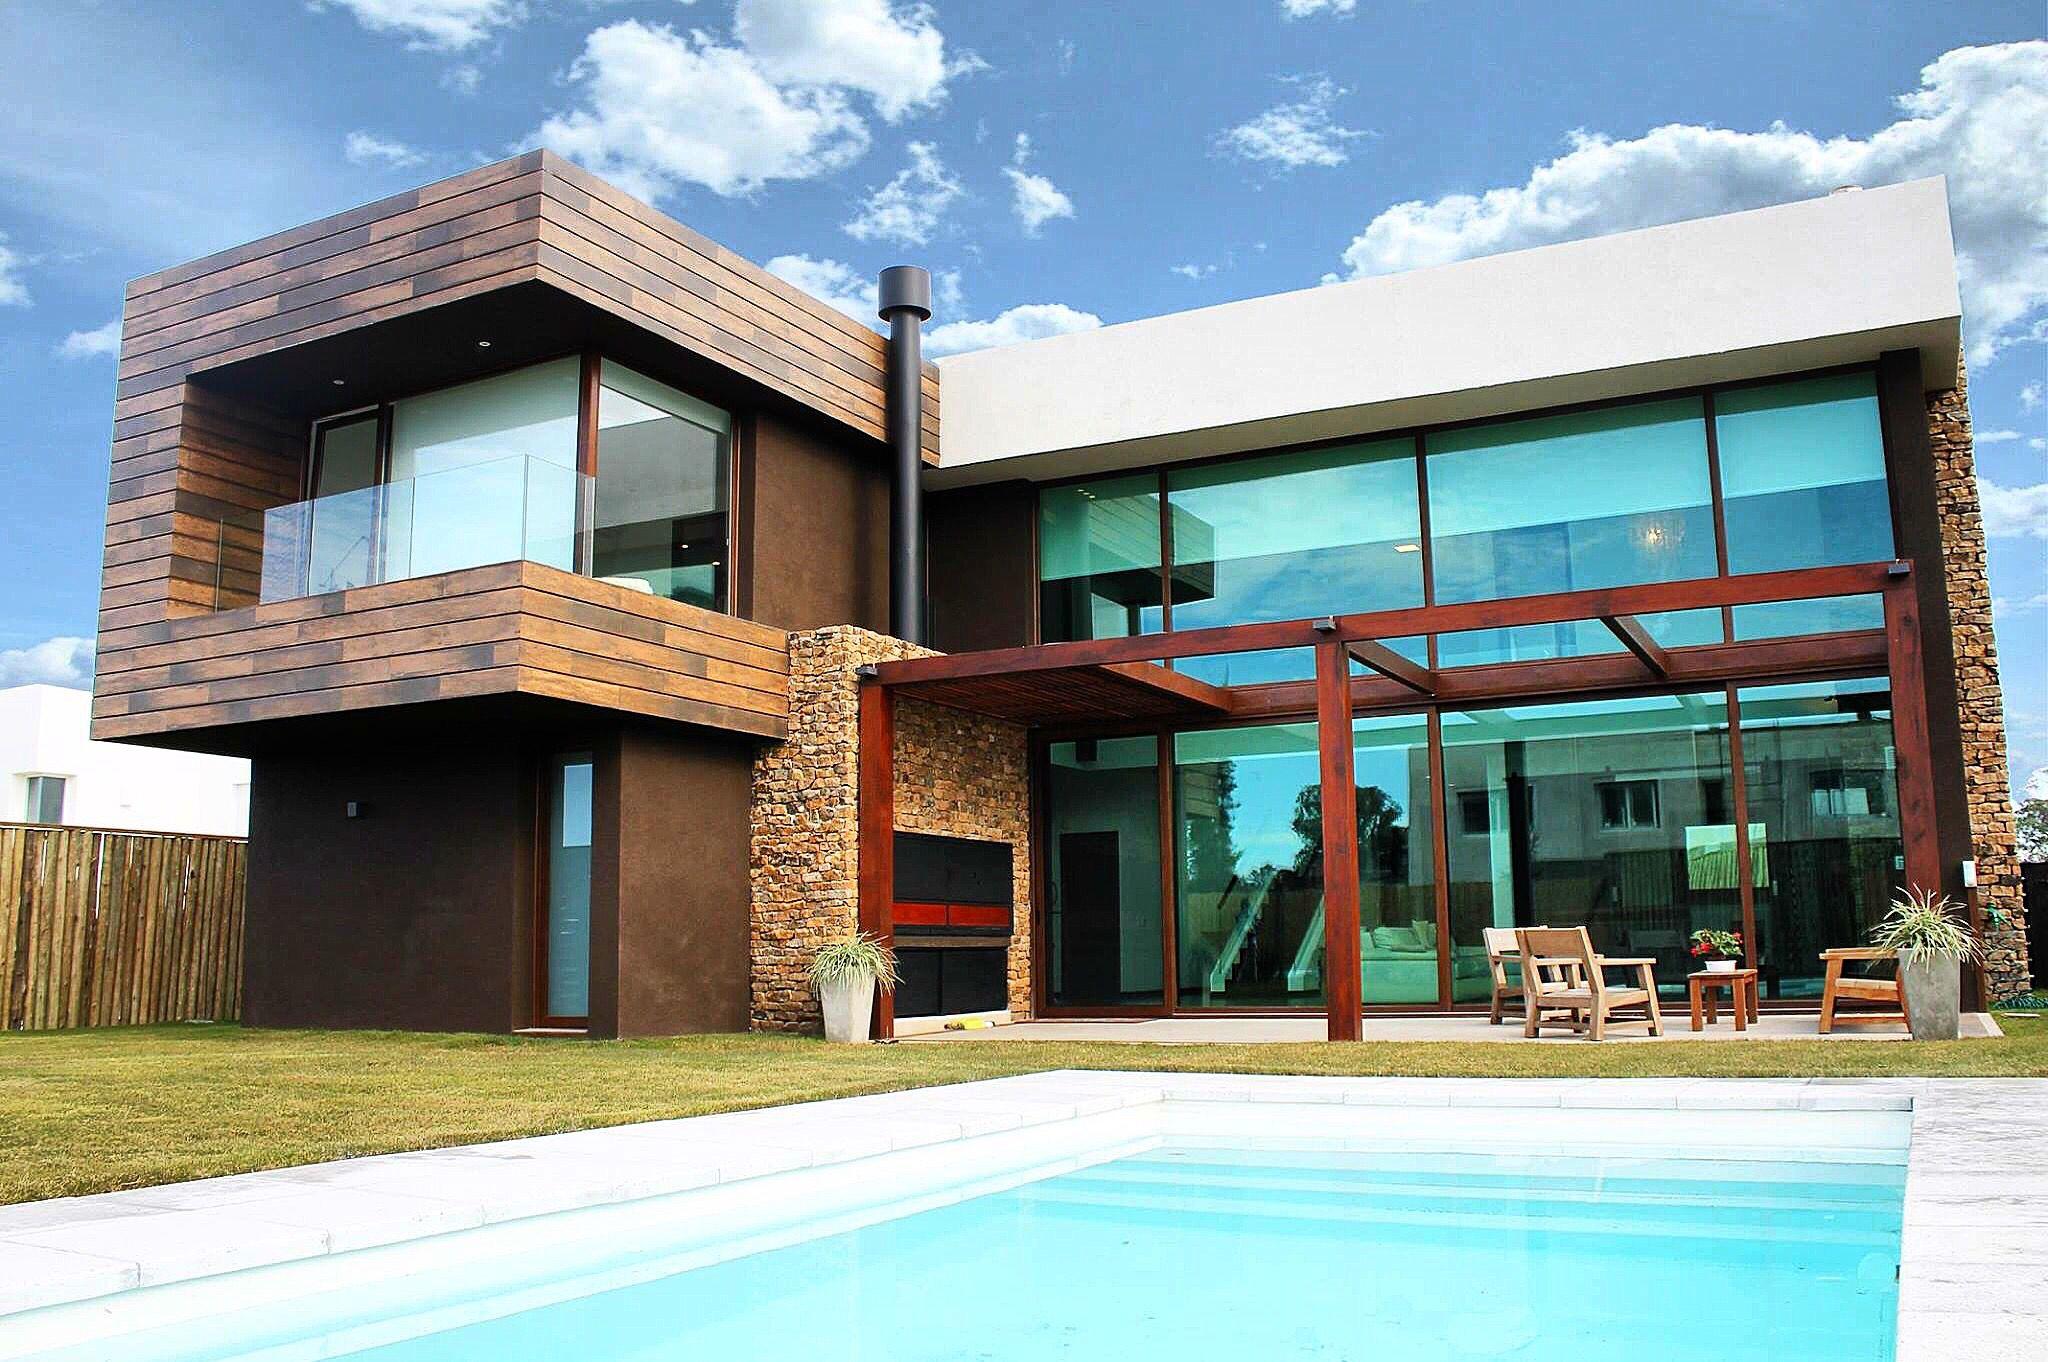 Uruguay montevideo punta del este colonia bazzurro arquitectos arqu modern house - Arquitectos casas modernas ...